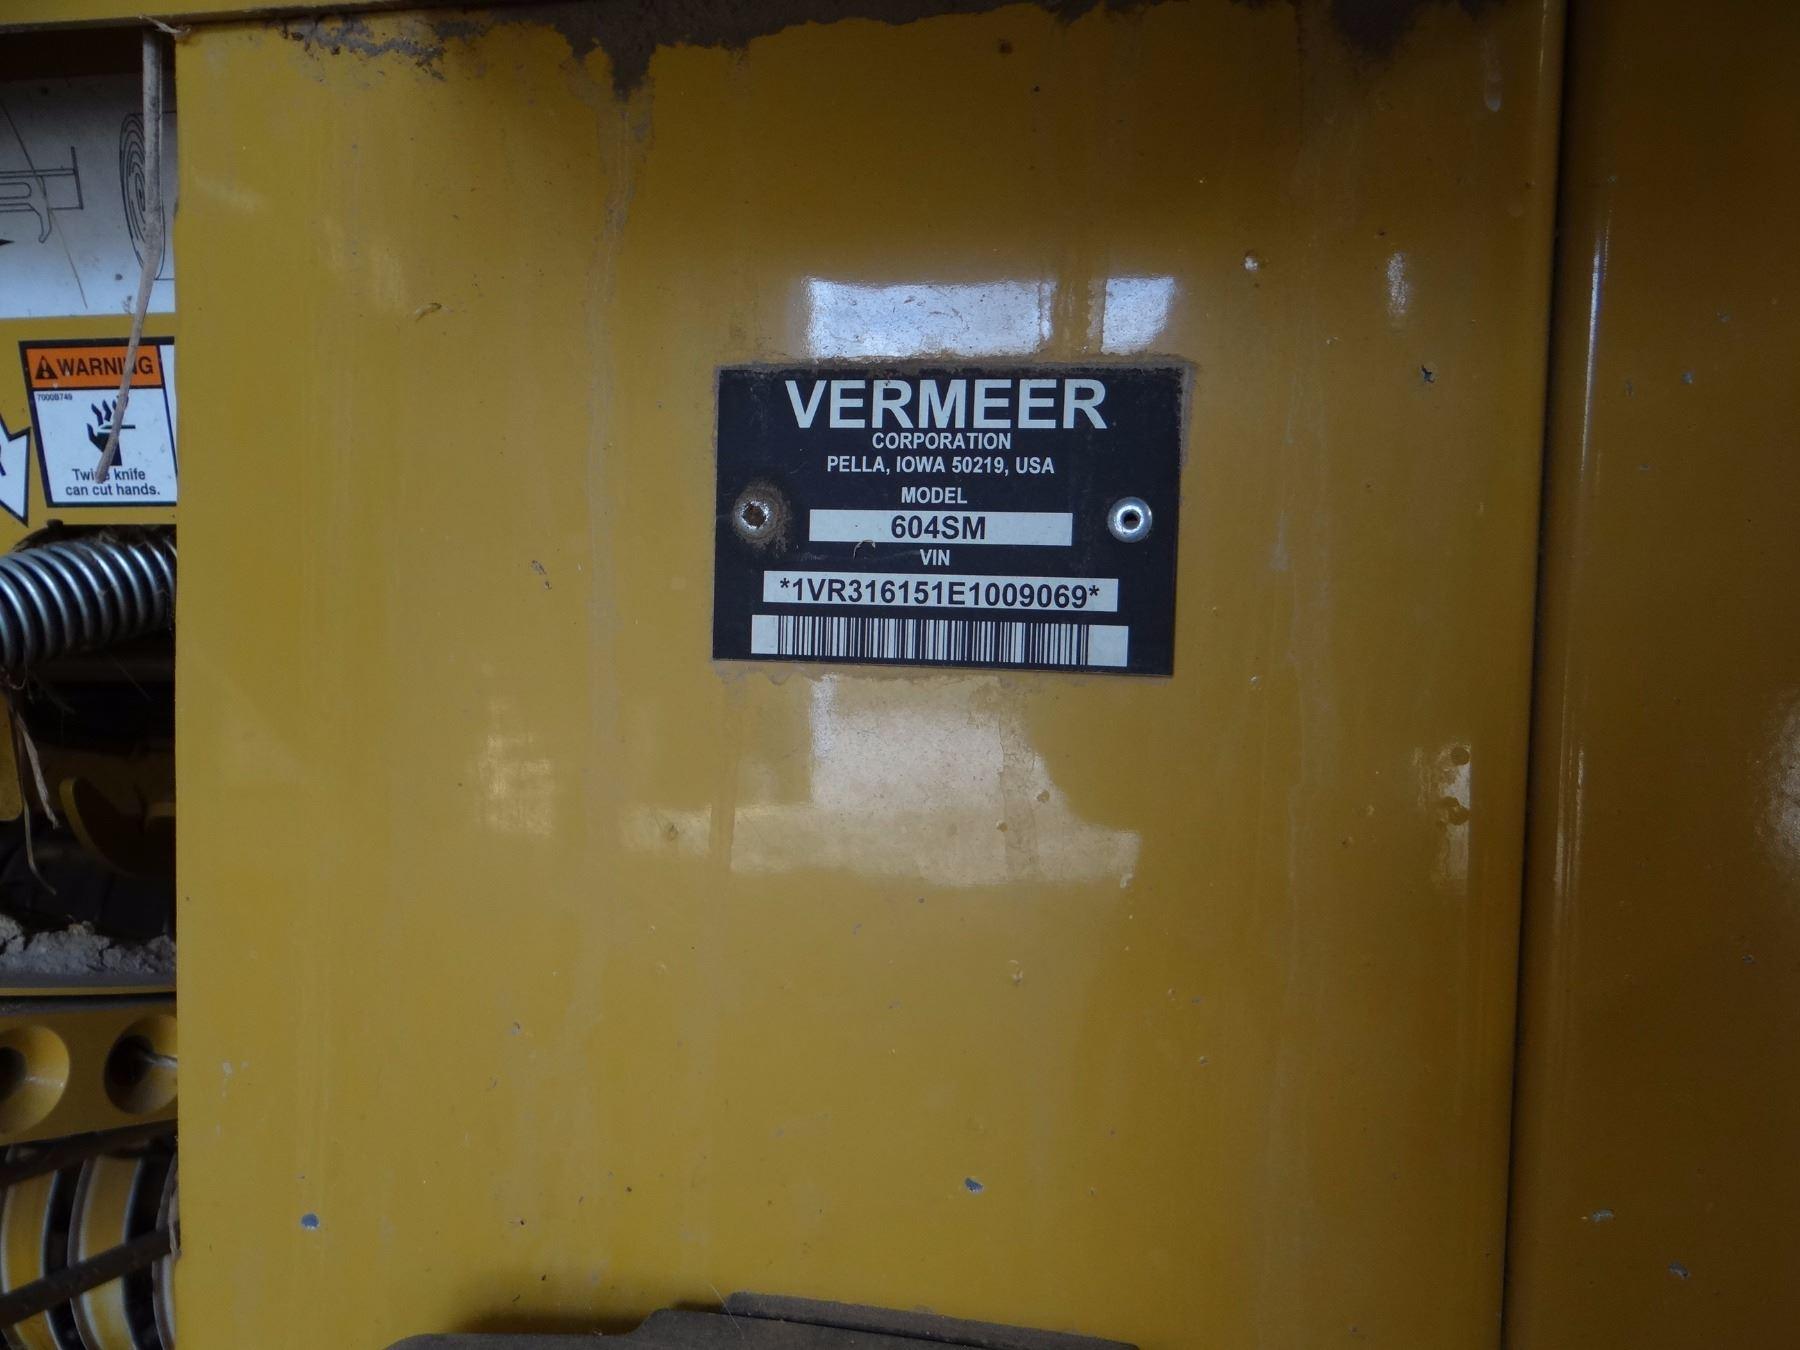 Vermeer 604 Super M round baler, makes a 4 ft -wide bale